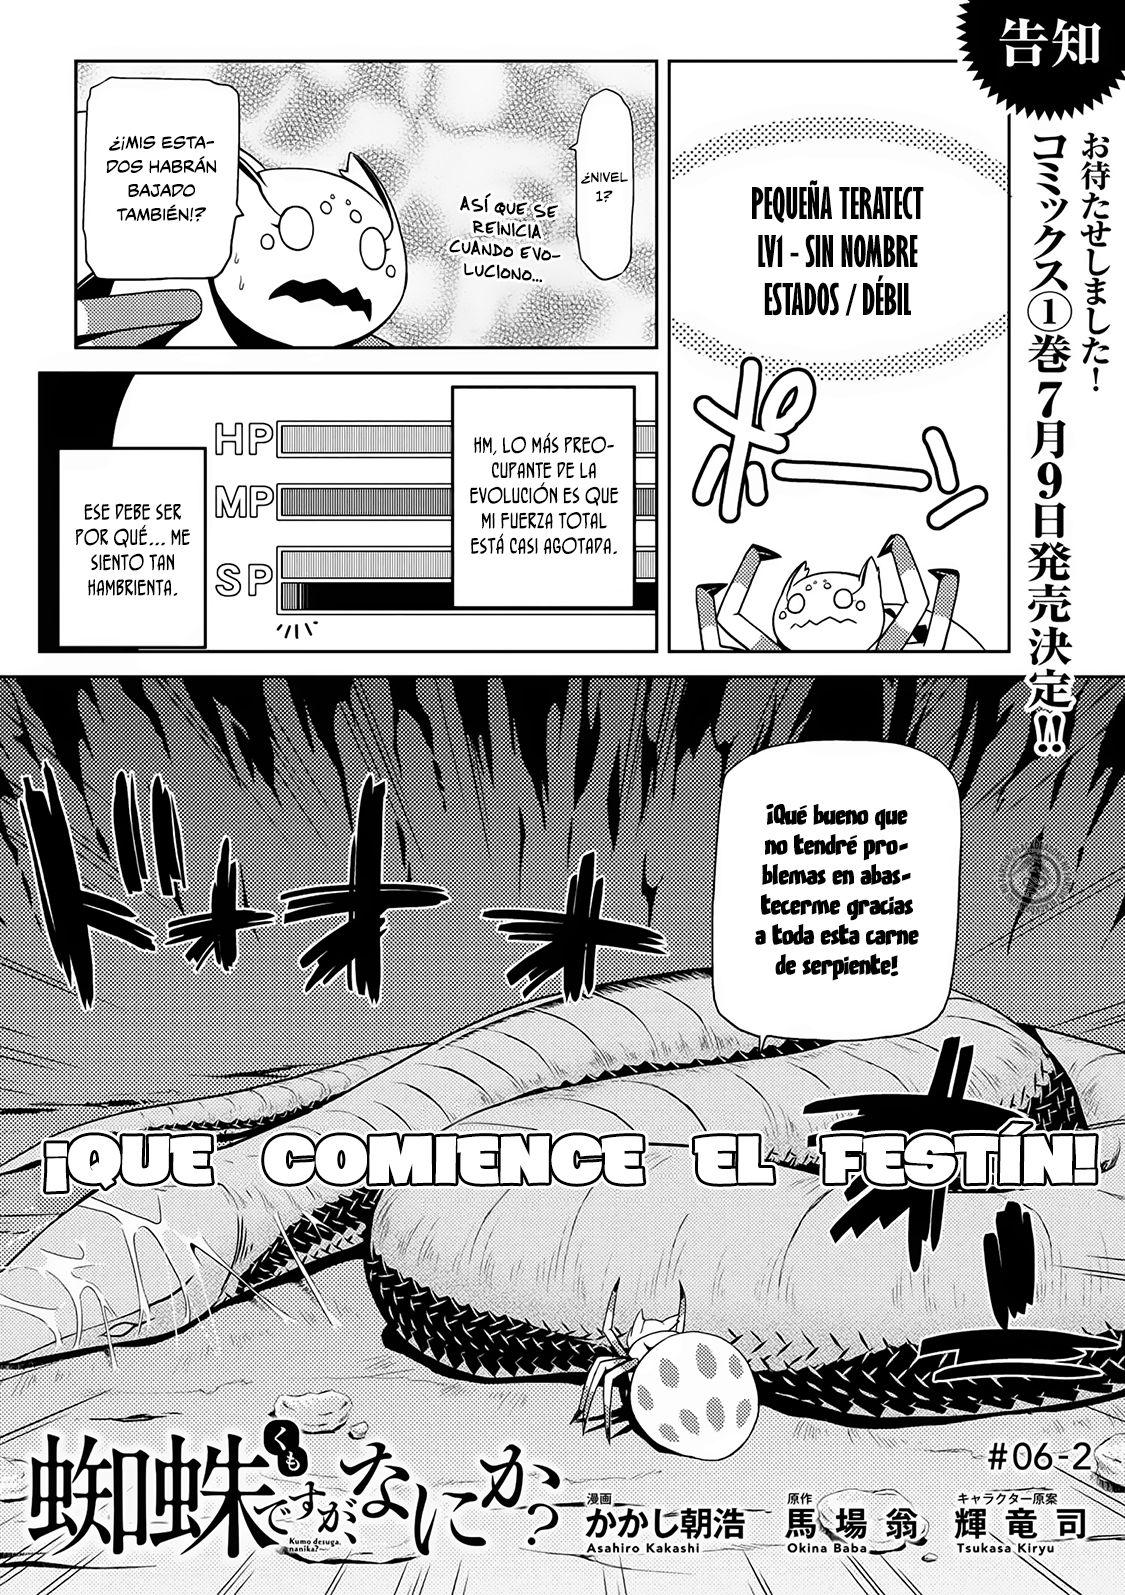 http://c5.ninemanga.com/es_manga/59/18683/478422/a70dfa90a1a881809860b651c4229810.jpg Page 3